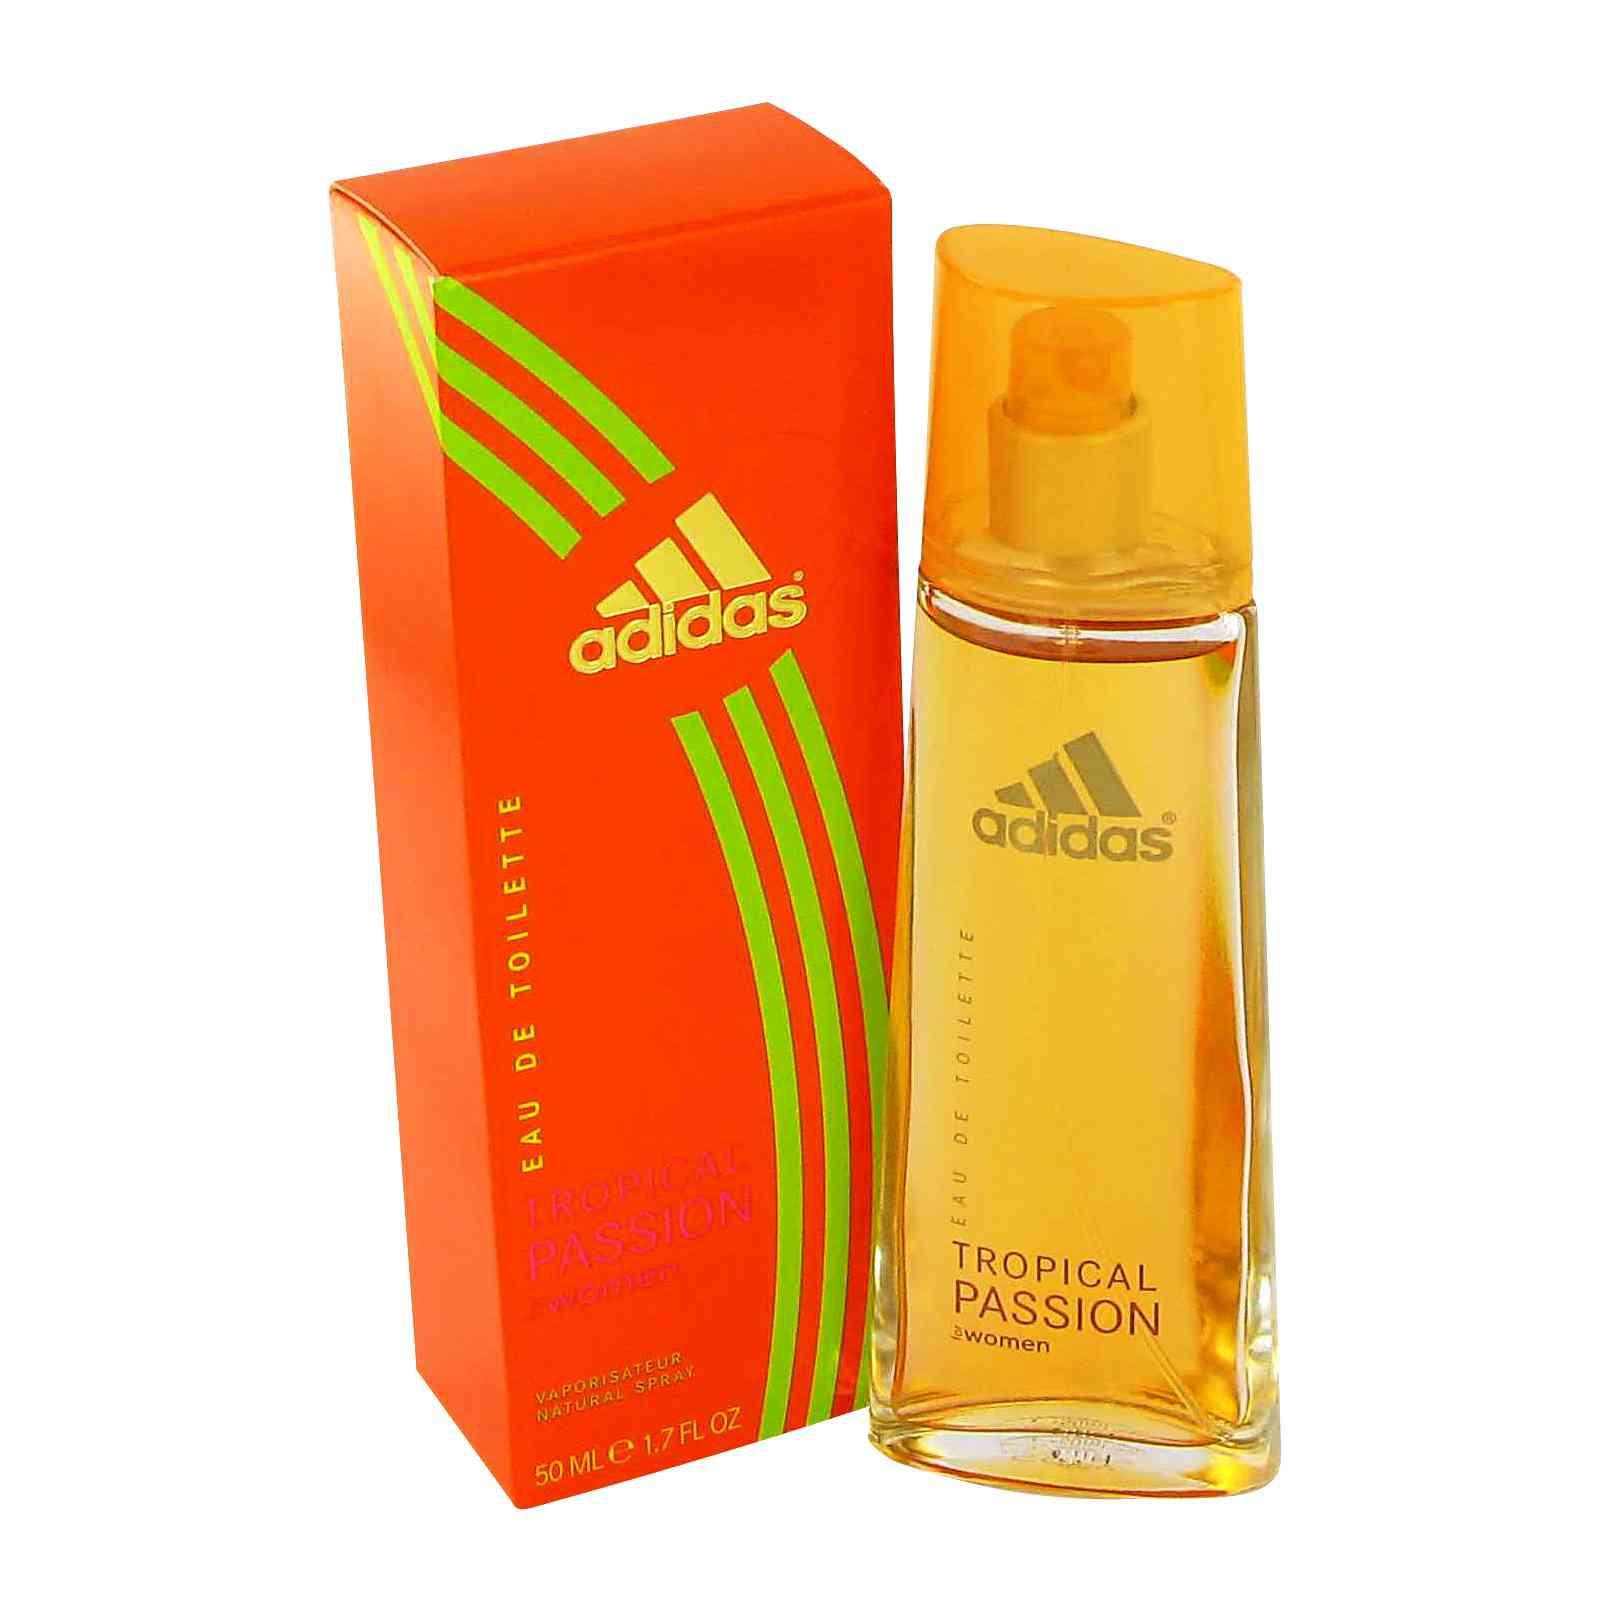 Adidas Tropical Passion аромат для женщин